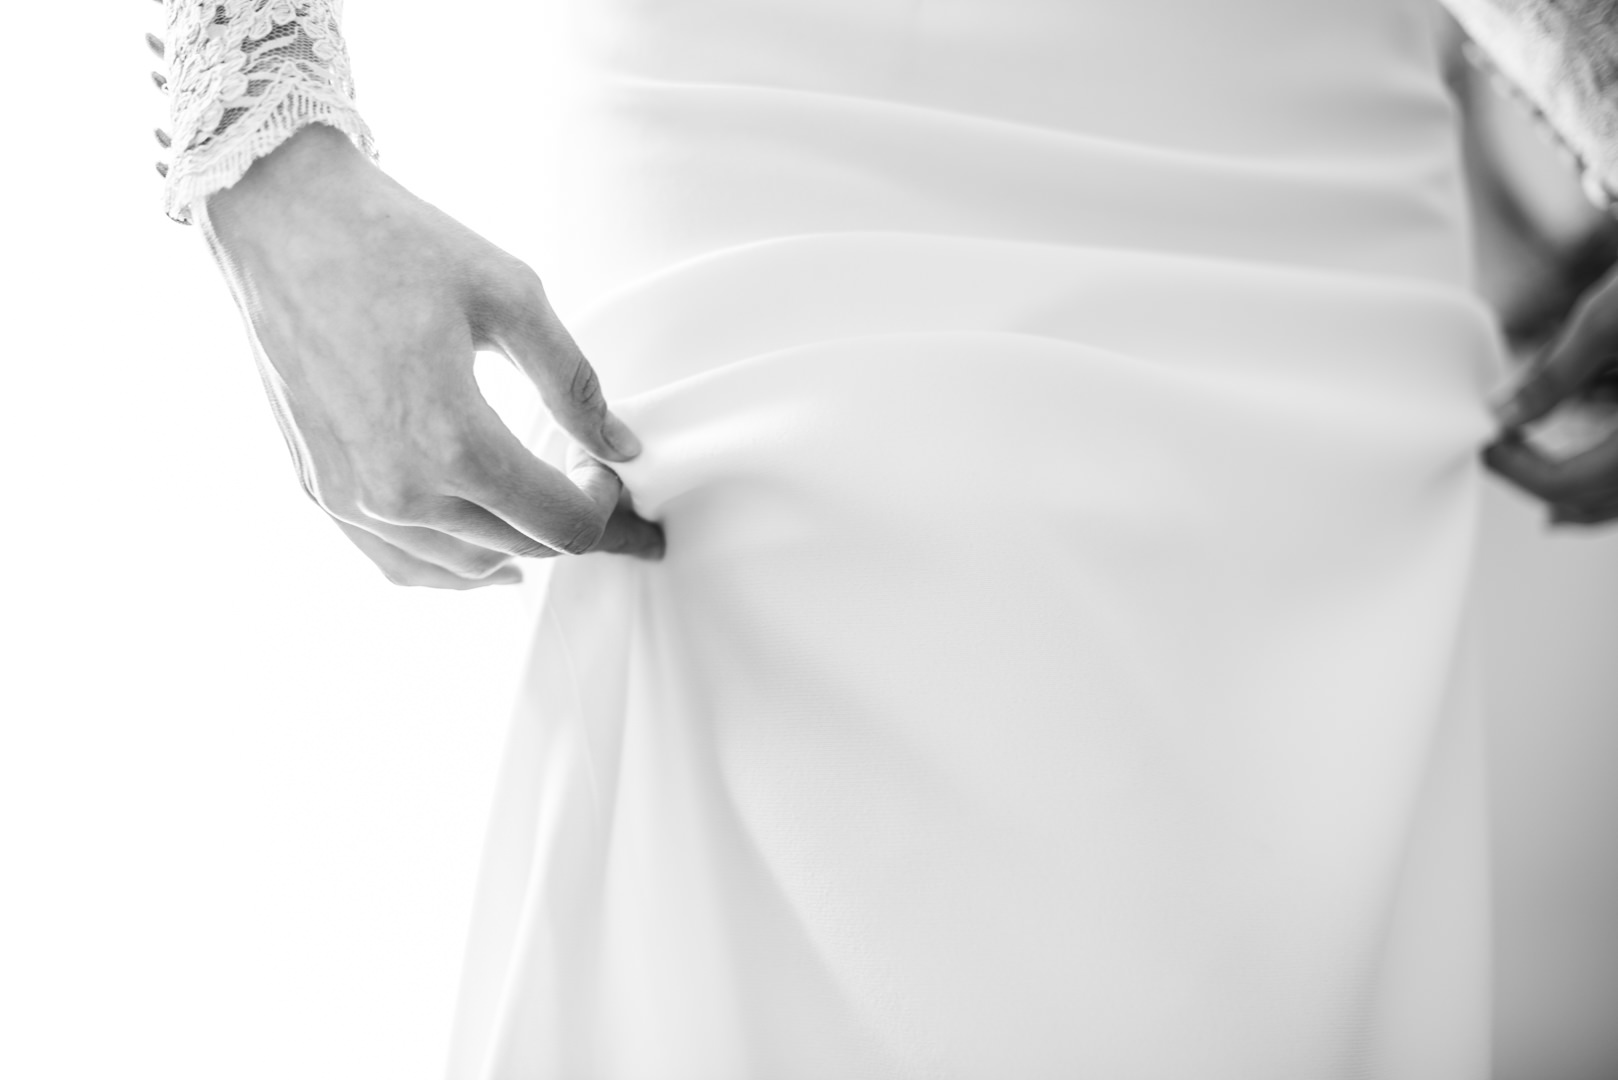 Boda-Sevilla-Museo-Carmona-Hamburgo-Maria-Carles-engagement-Rafael-Torres-fotografo-bodas-sevilla-madrid-barcelona-wedding-photographer--12.jpg